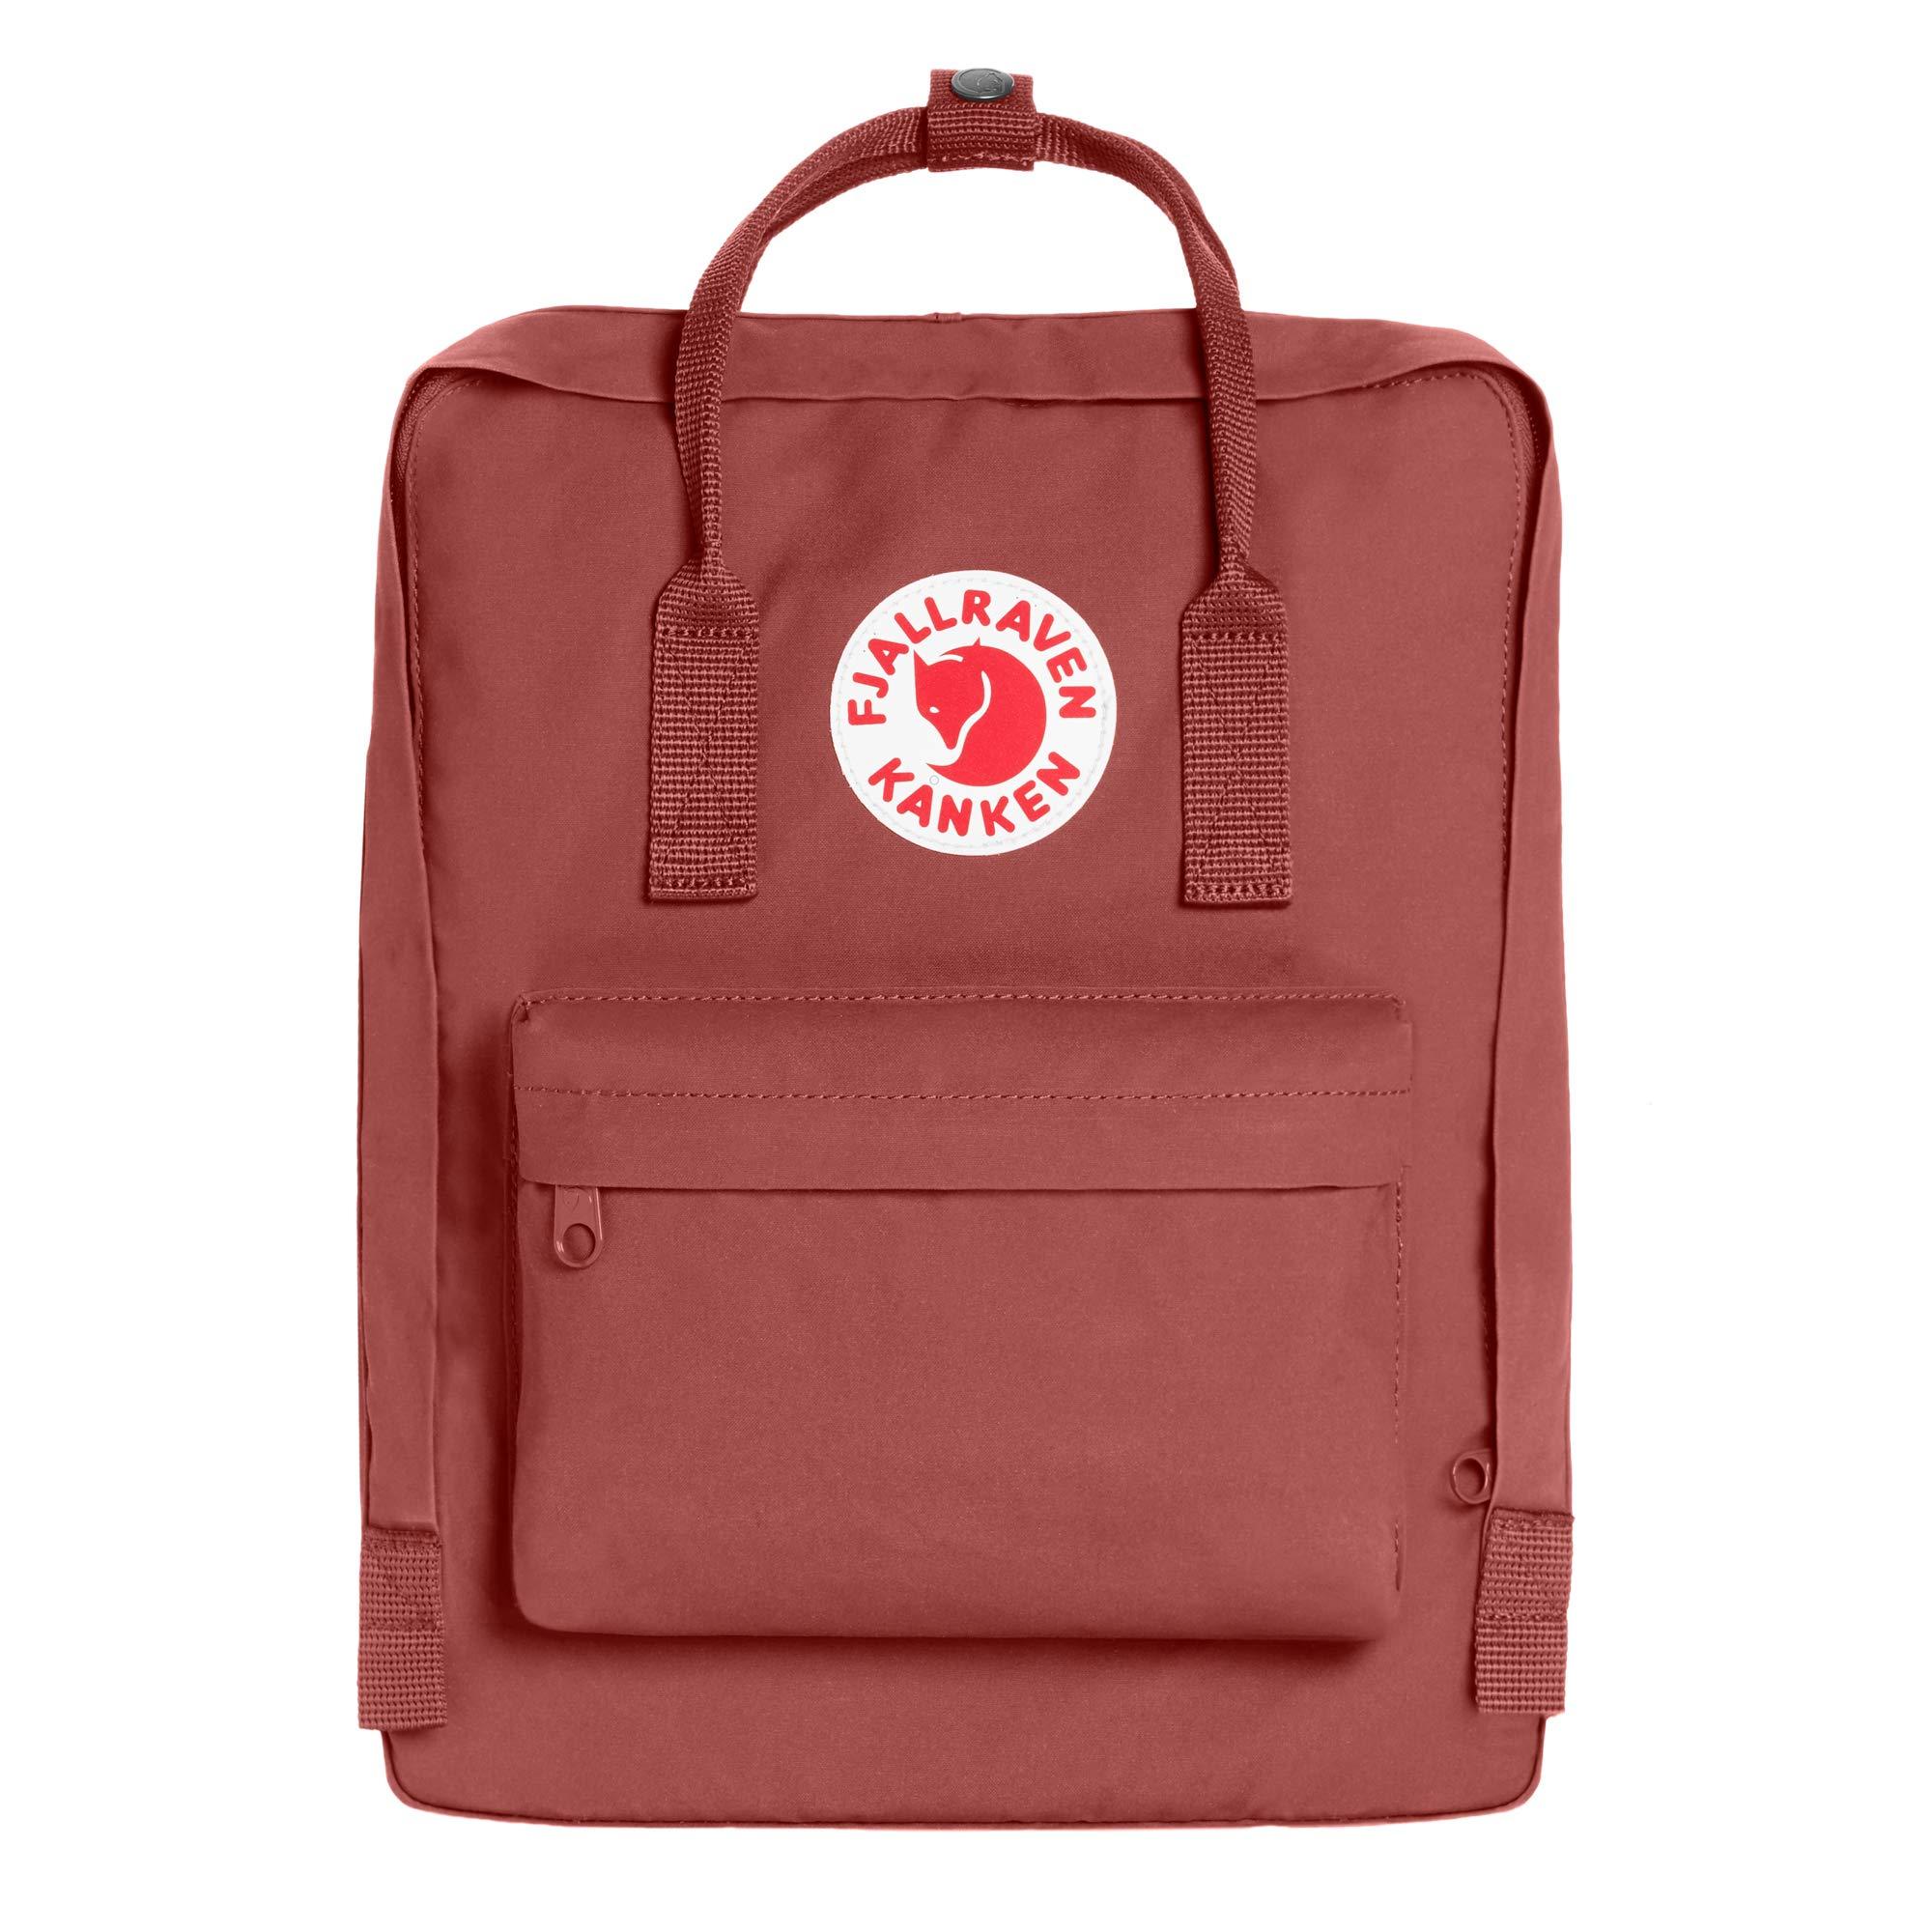 Fjallraven - Kanken Classic Backpack for Everyday, Dahlia by Fjallraven (Image #1)